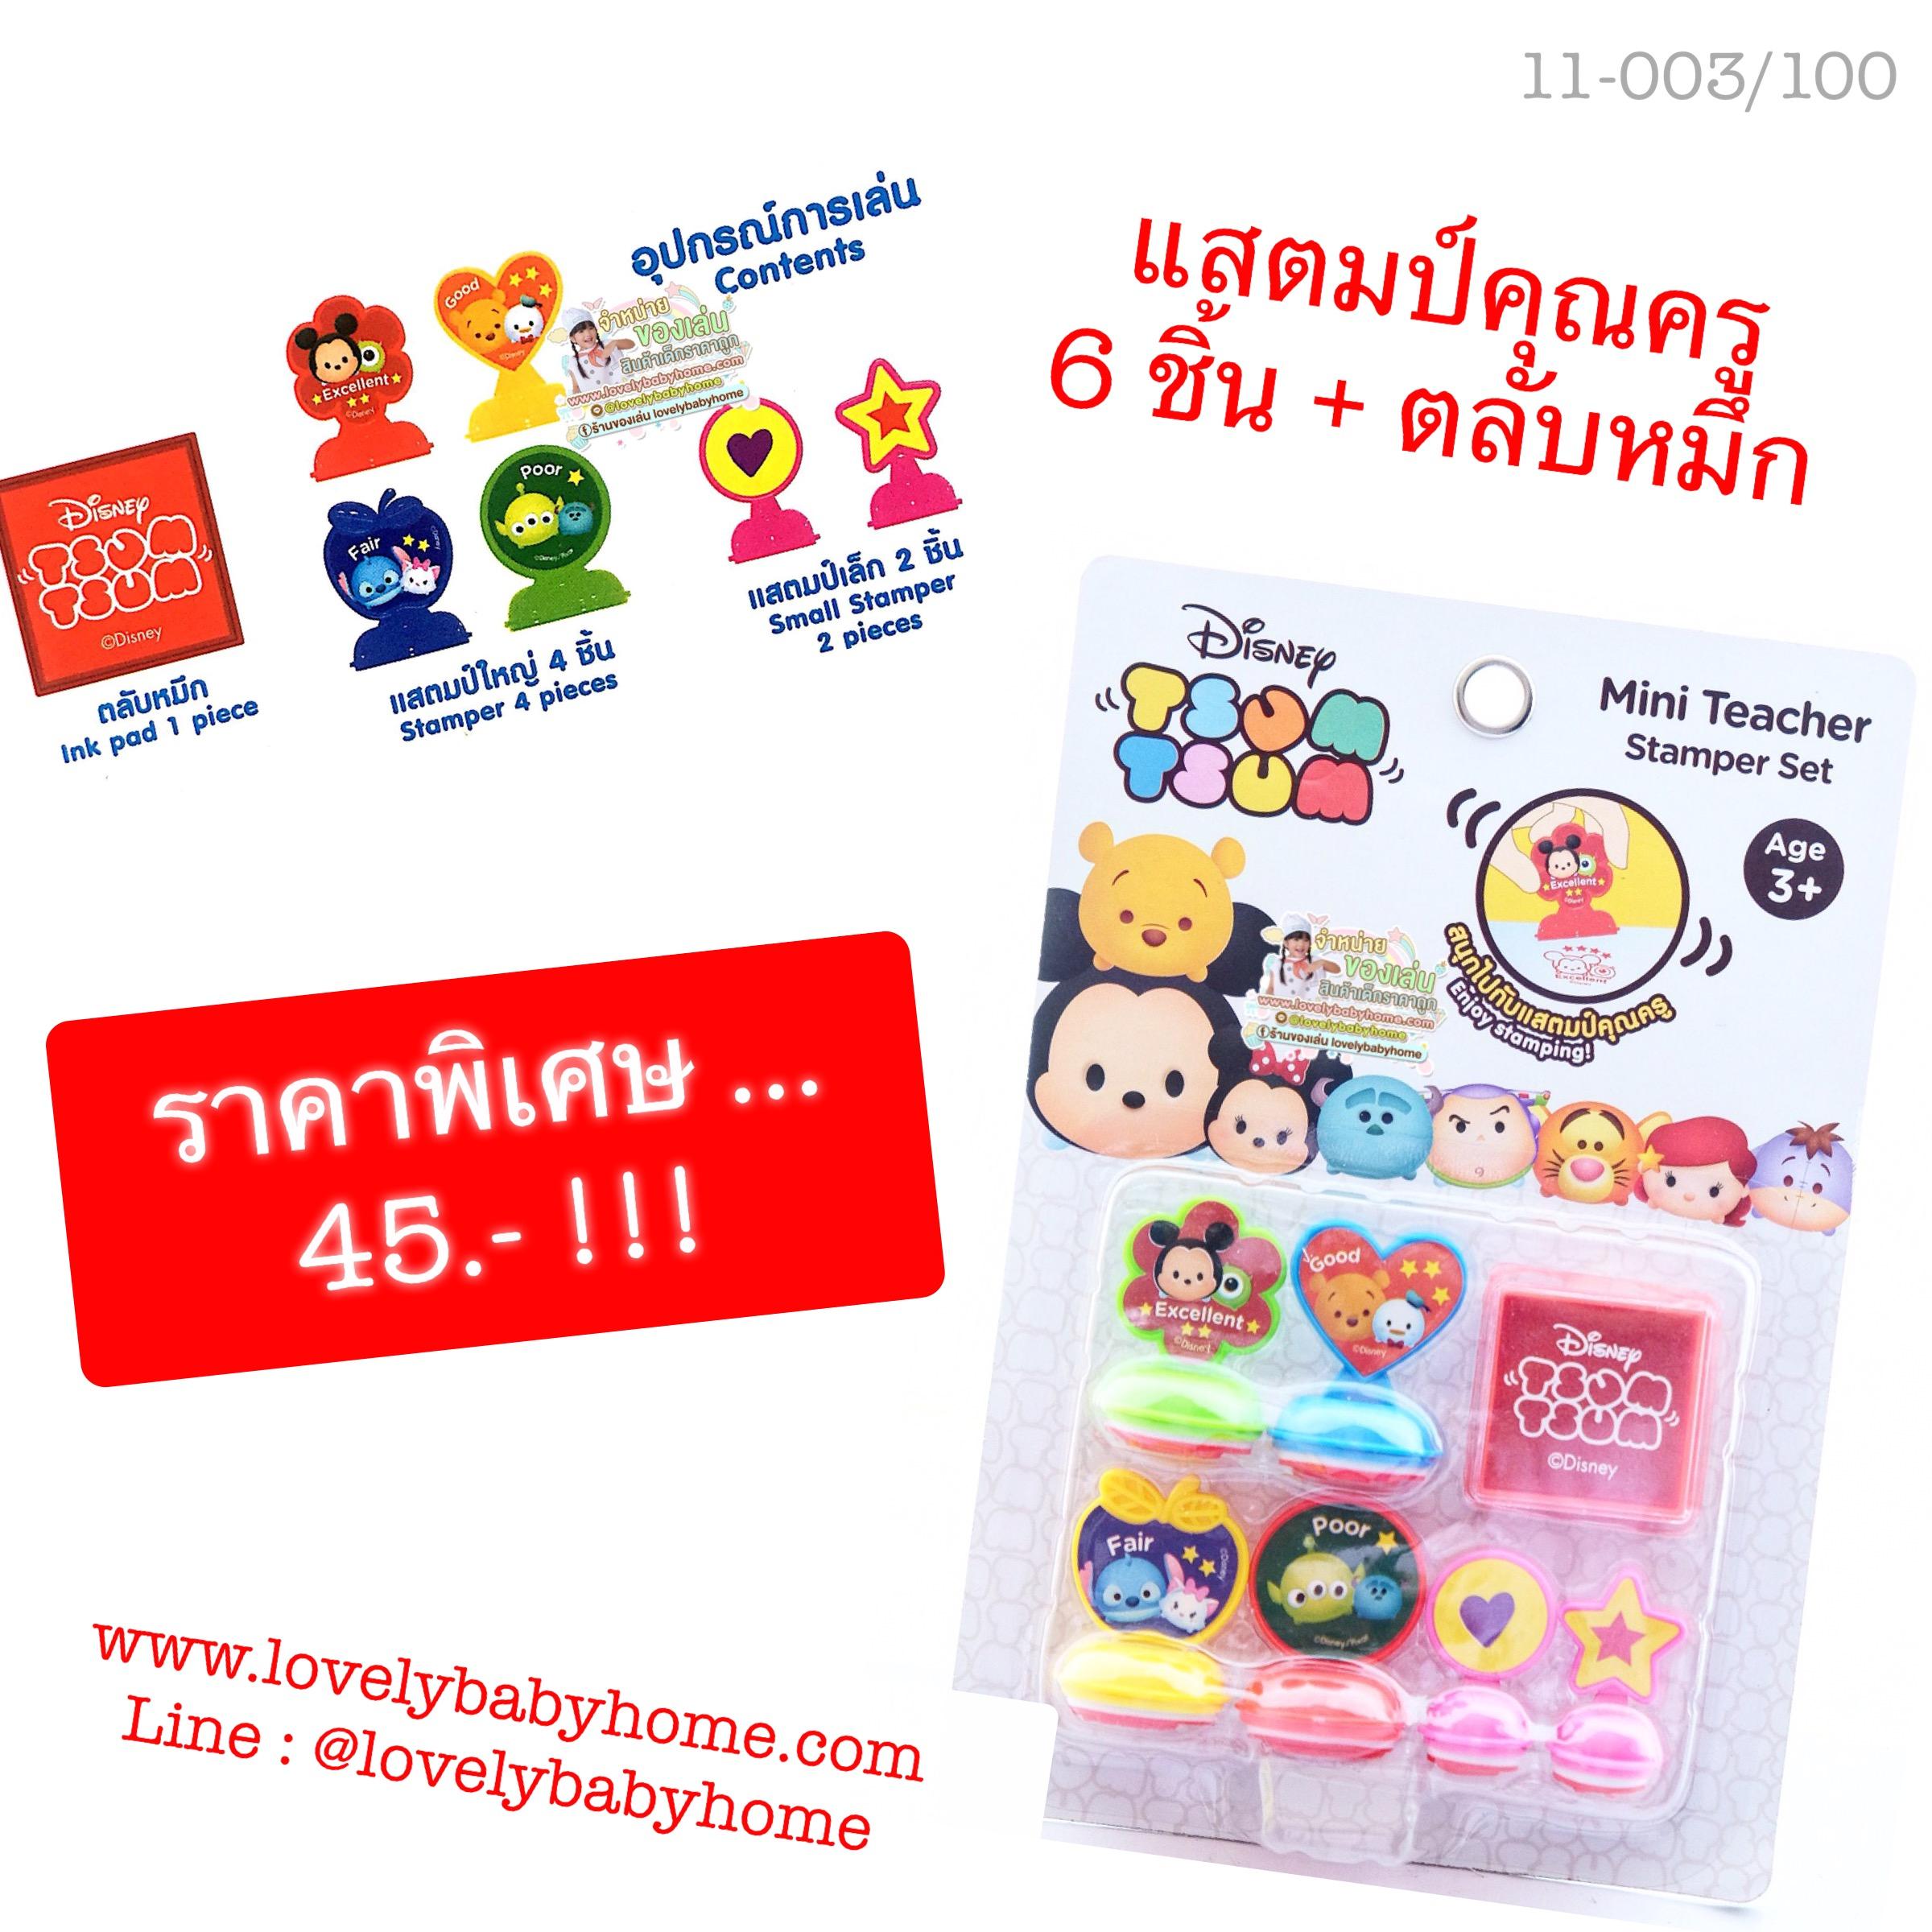 Mini Teacher Stamper Set (ชุดแสตมป์คุณครู)